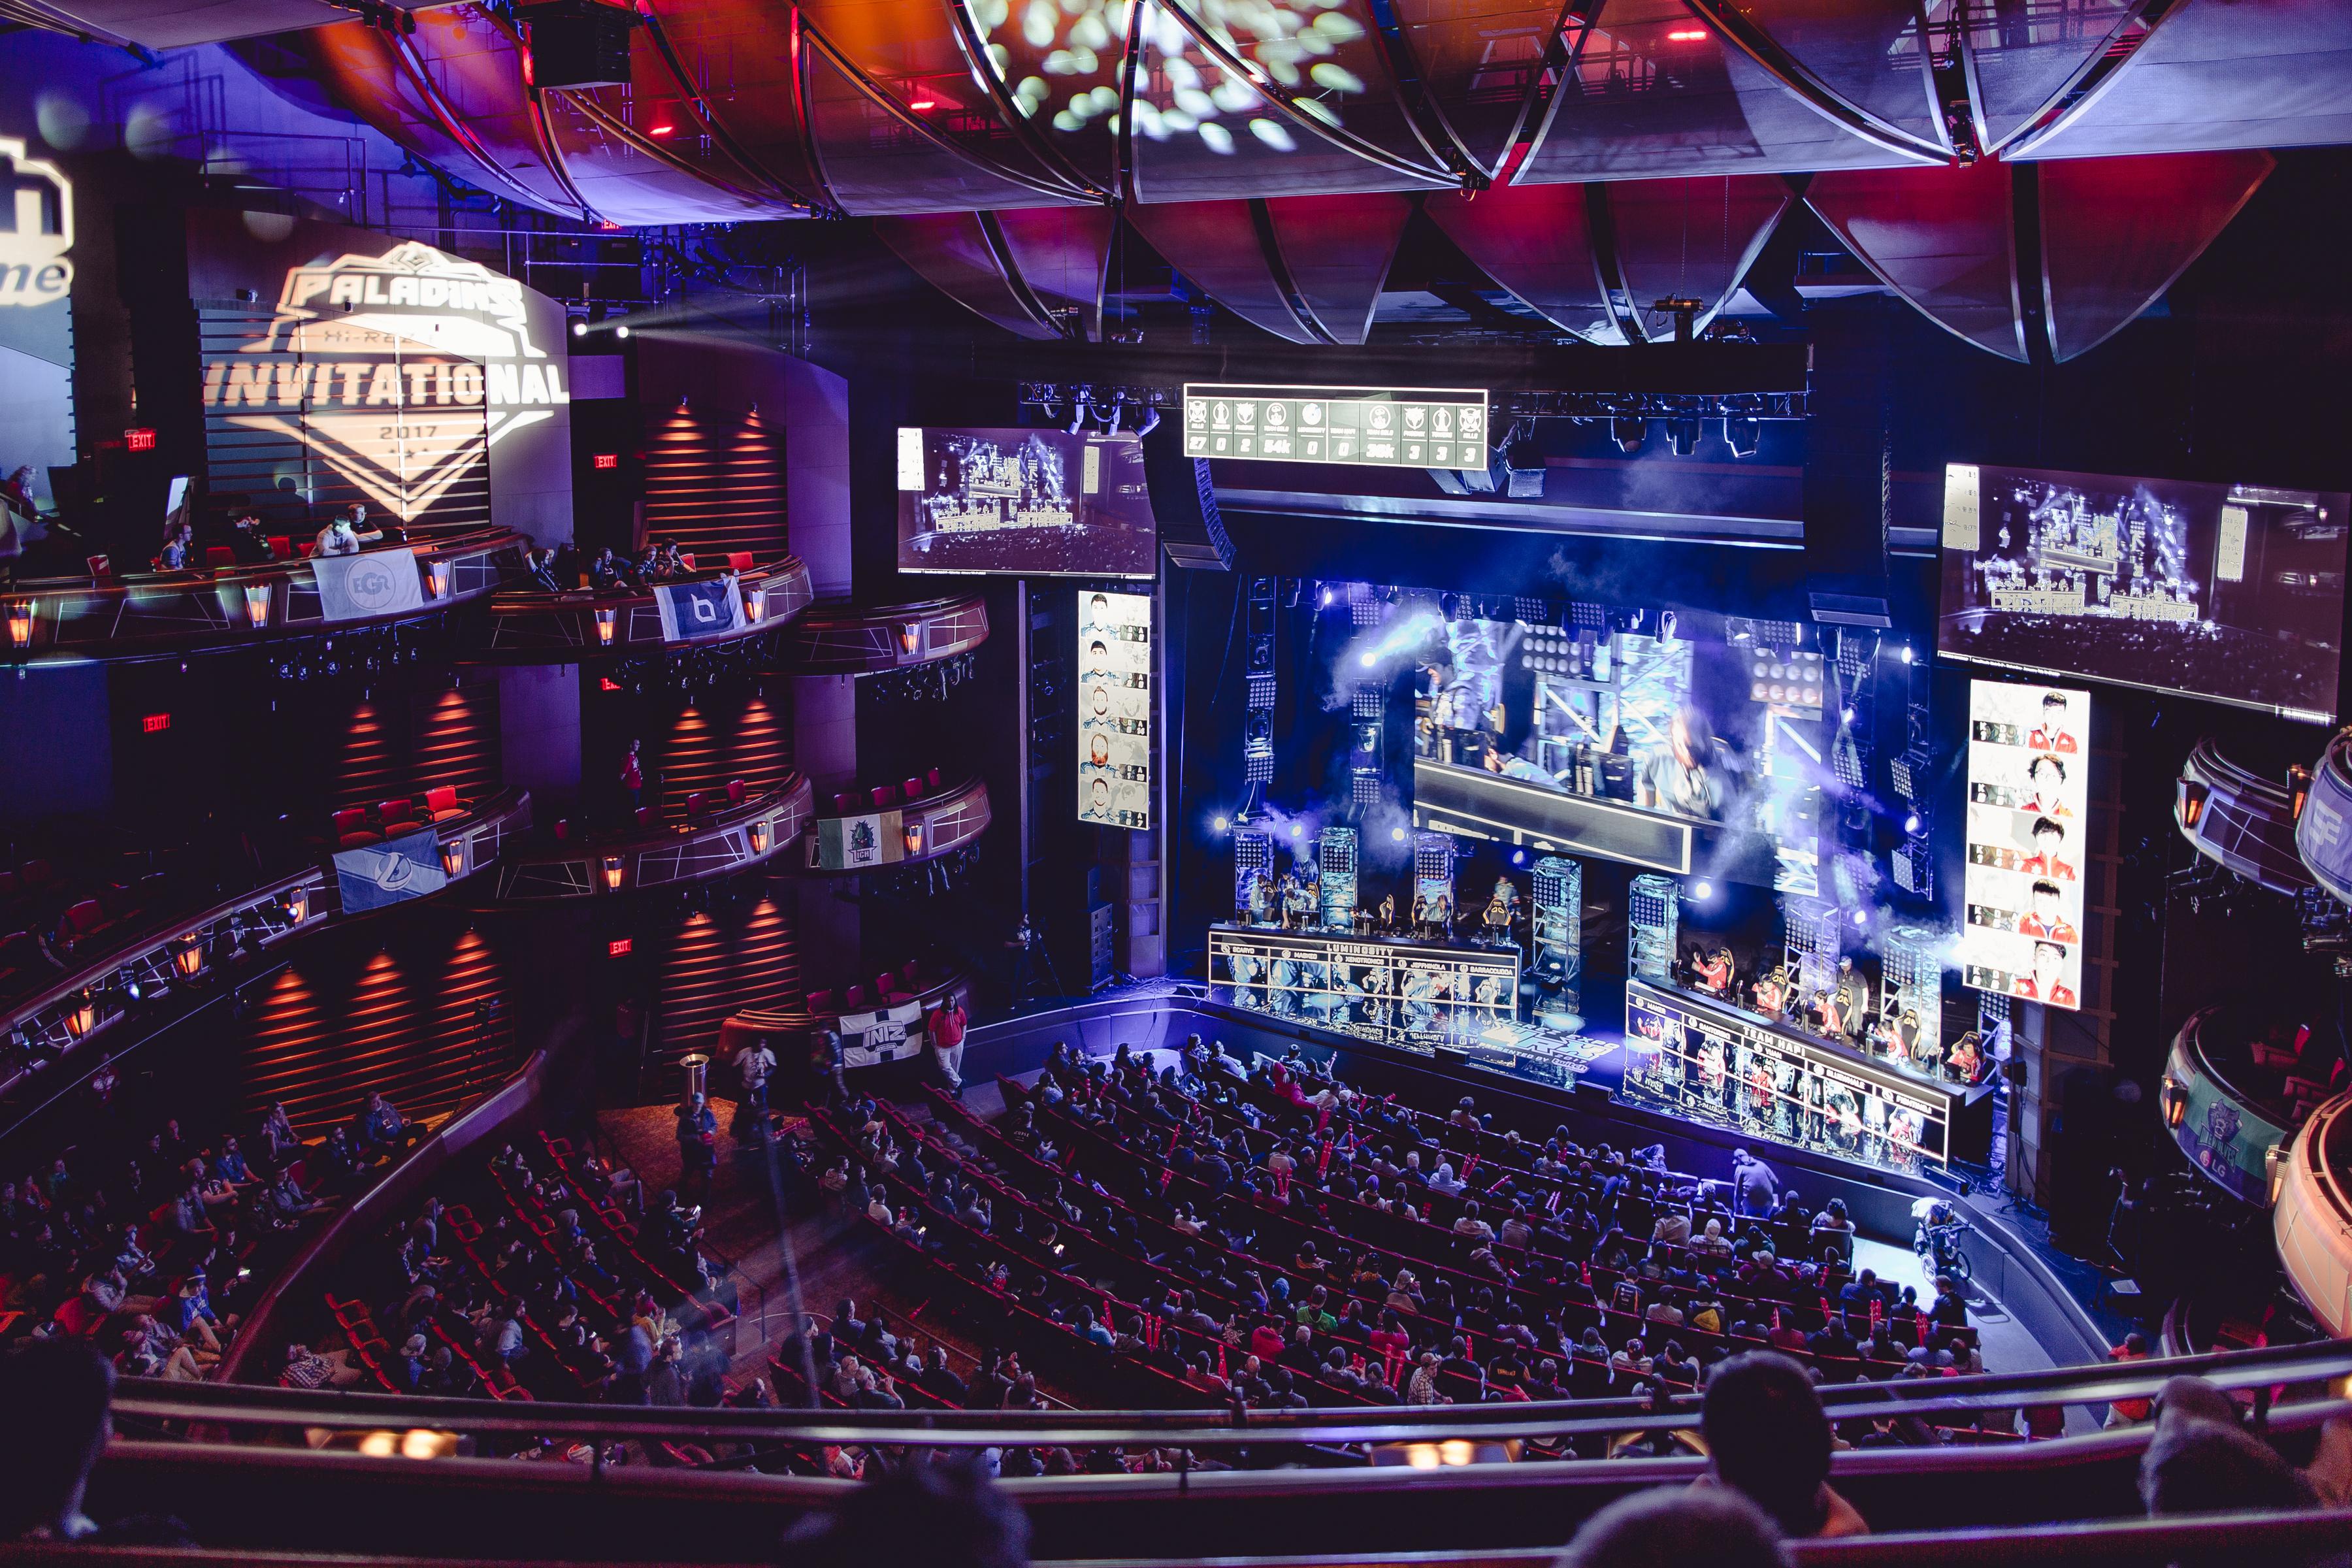 The crowd at the Paladins Hi-Rez Expo Invitational 2017 eSports tournament in Atlanta.